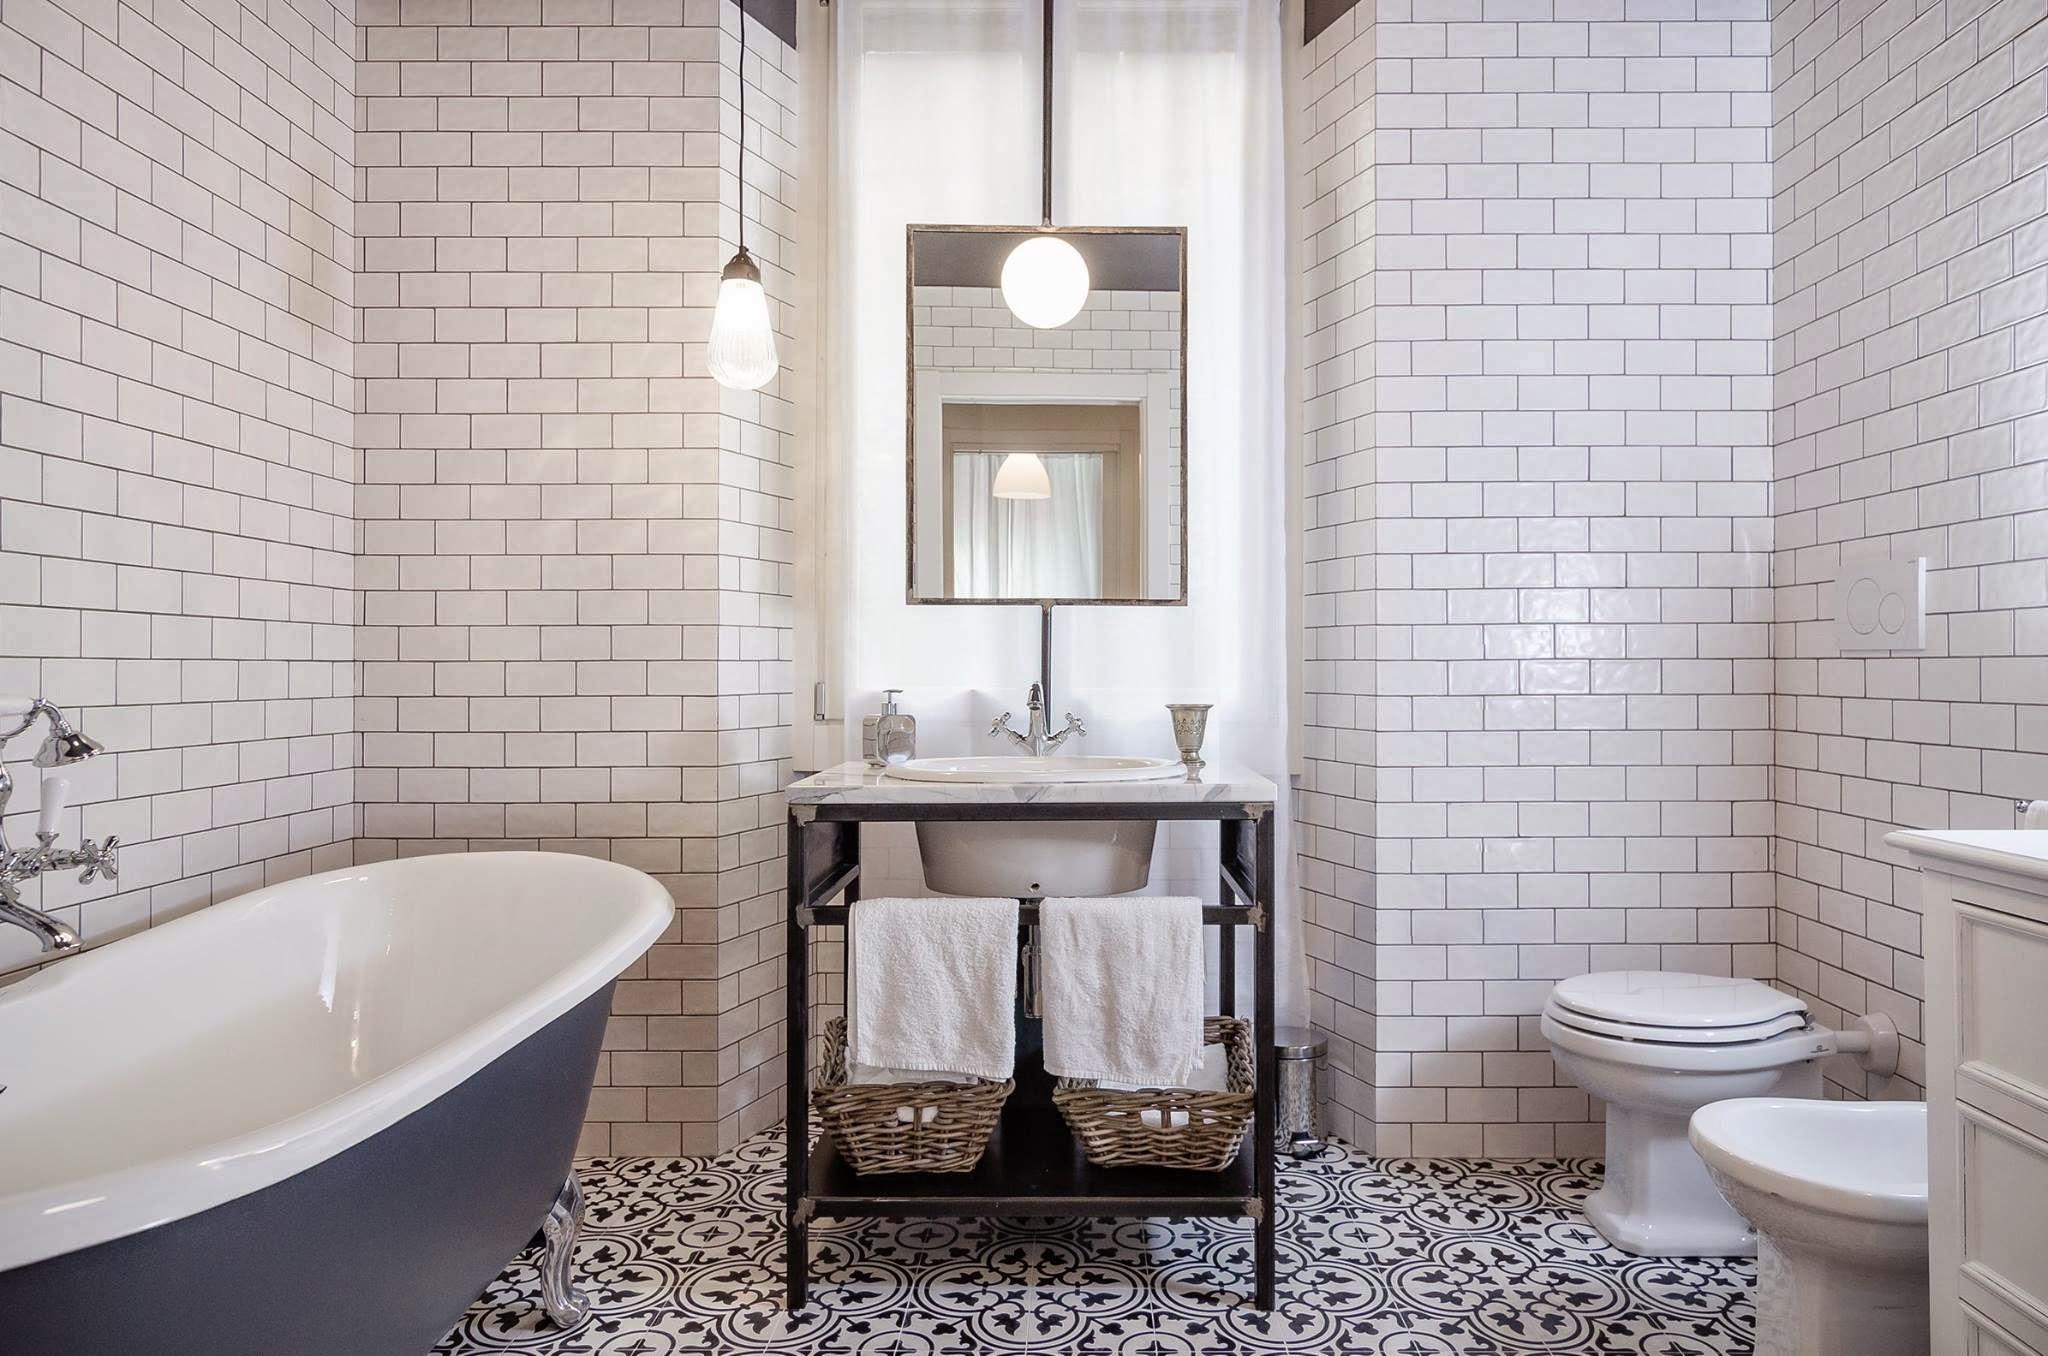 15 ispirazioni per un bagno vintage livingcorriere - Piastrelle cucina vintage ...